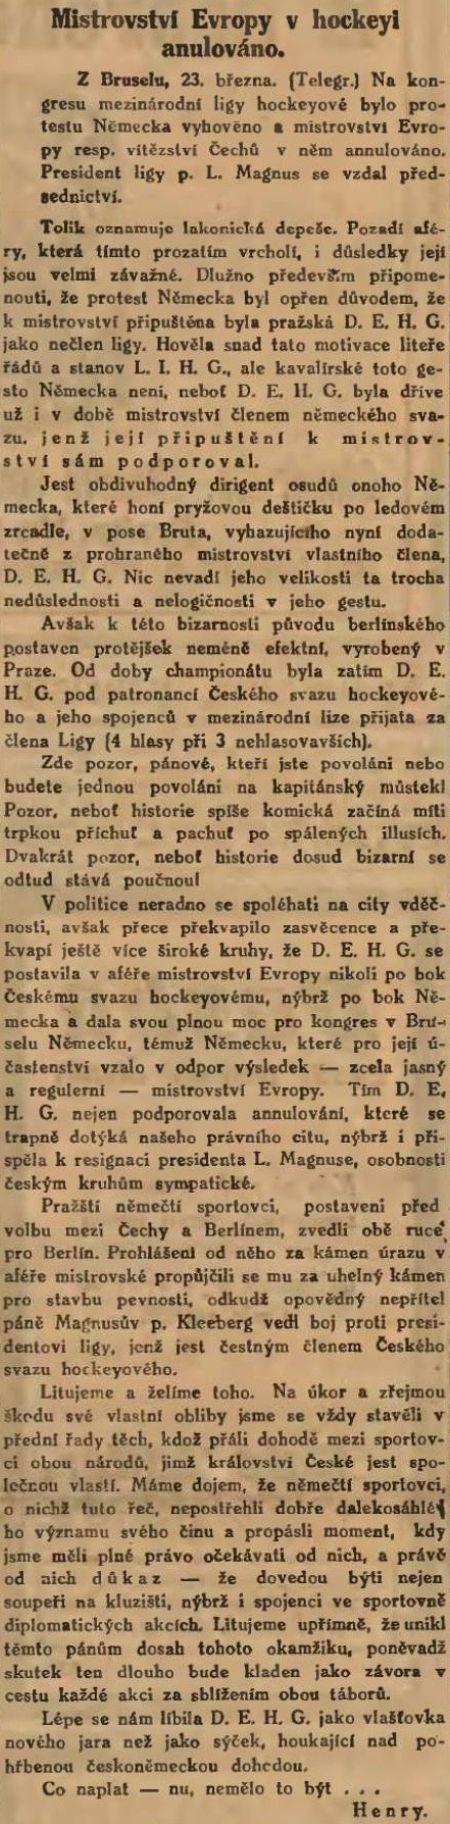 NL 1912-03-24.jpg